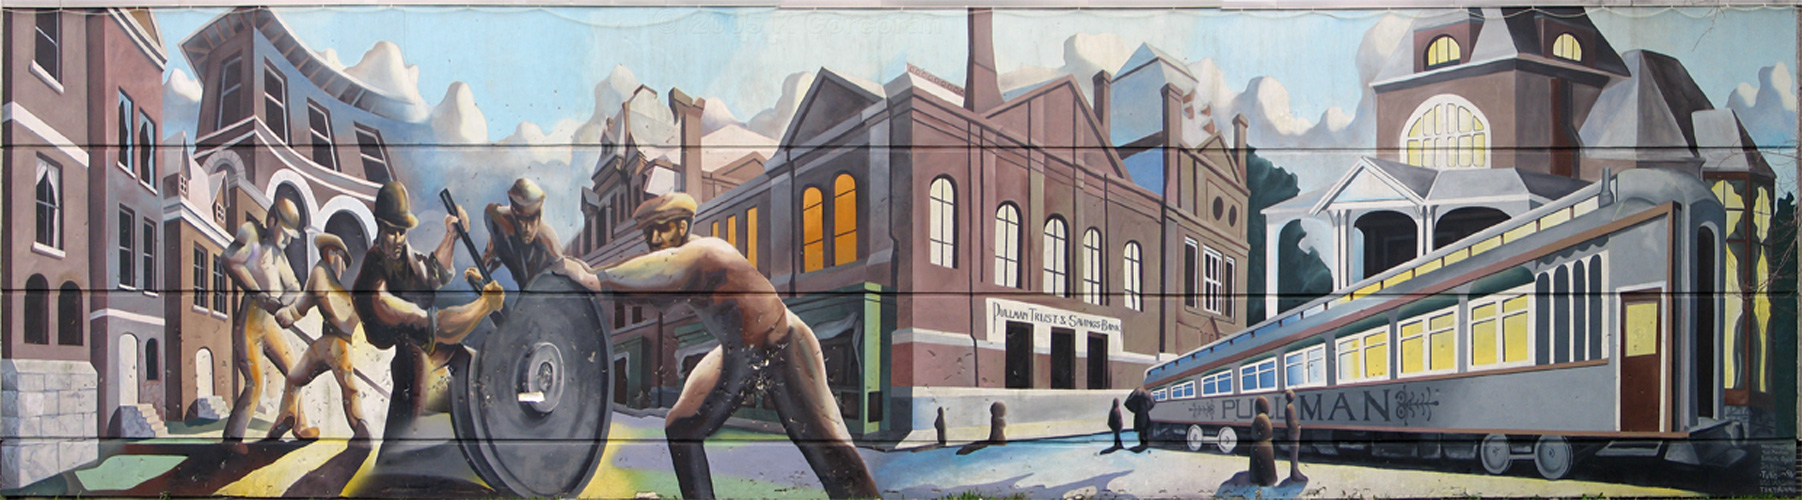 Pullman Mural.jpg